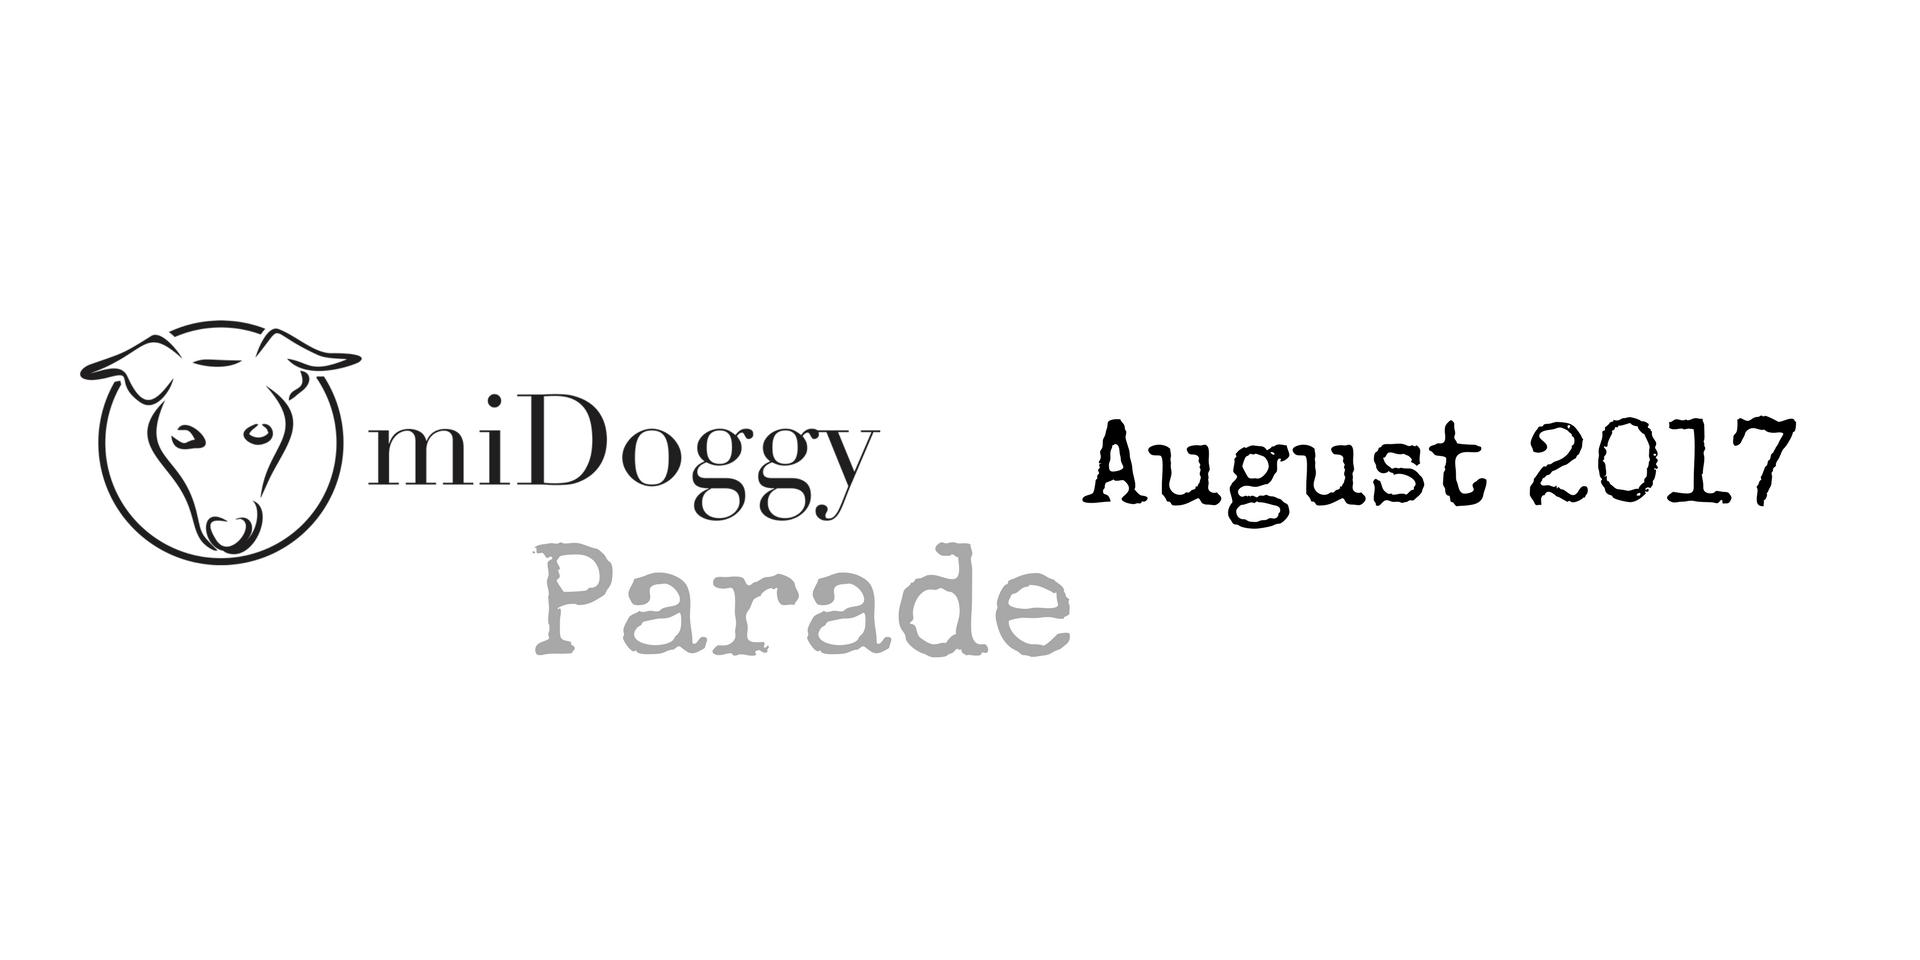 miDoggy Parade Blogparade Hundeblogger August 2017